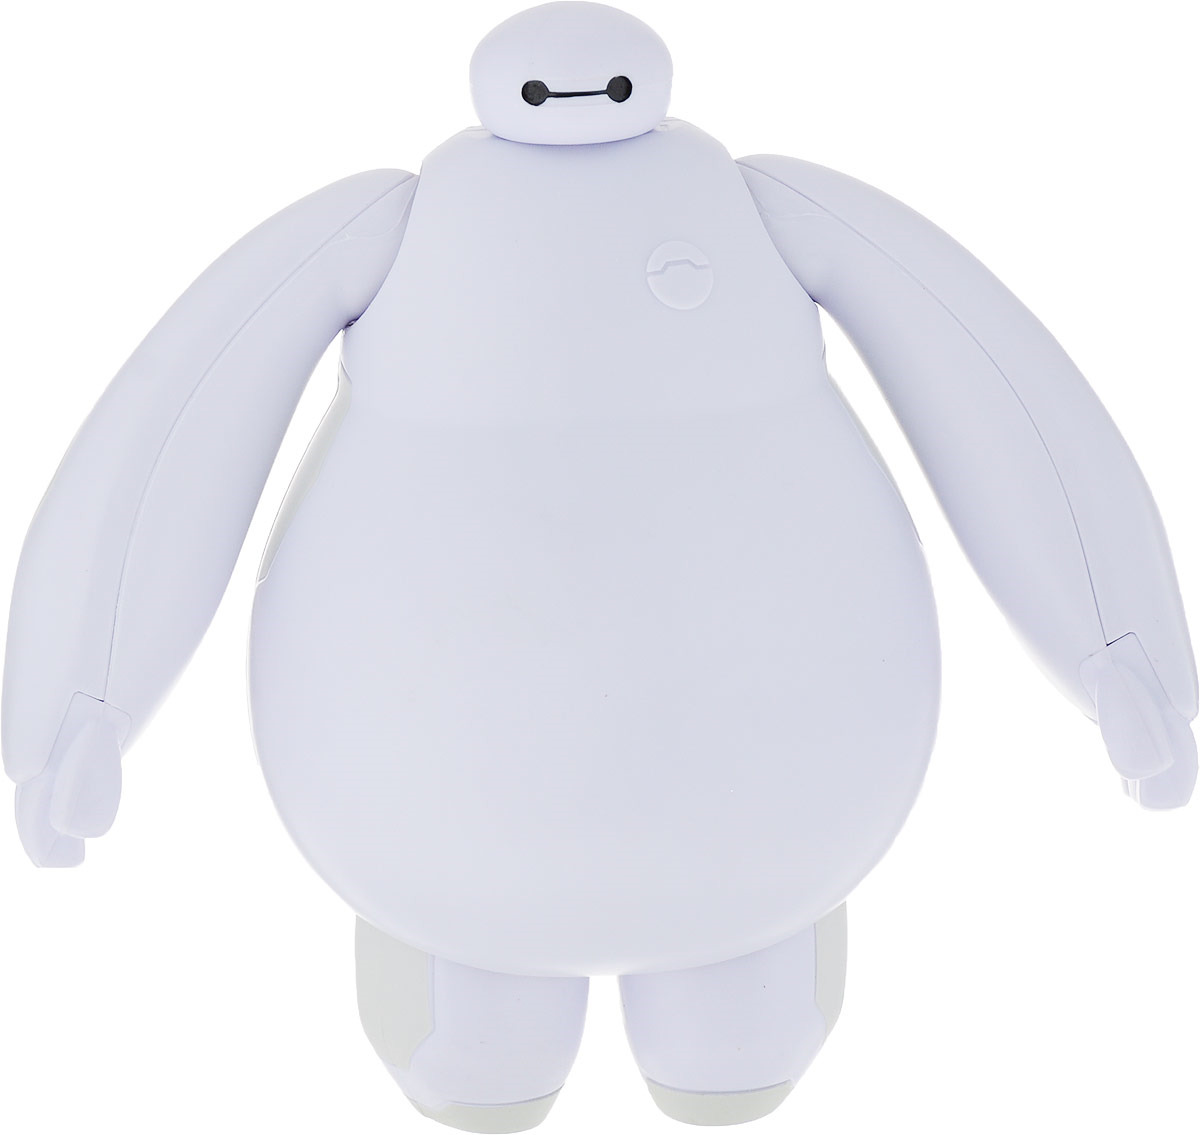 Фигурка Big Hero 6 Baymax, 41275, белый фигурка героя мультфильма hay 2015 1 pc heartfilia 21cm t243